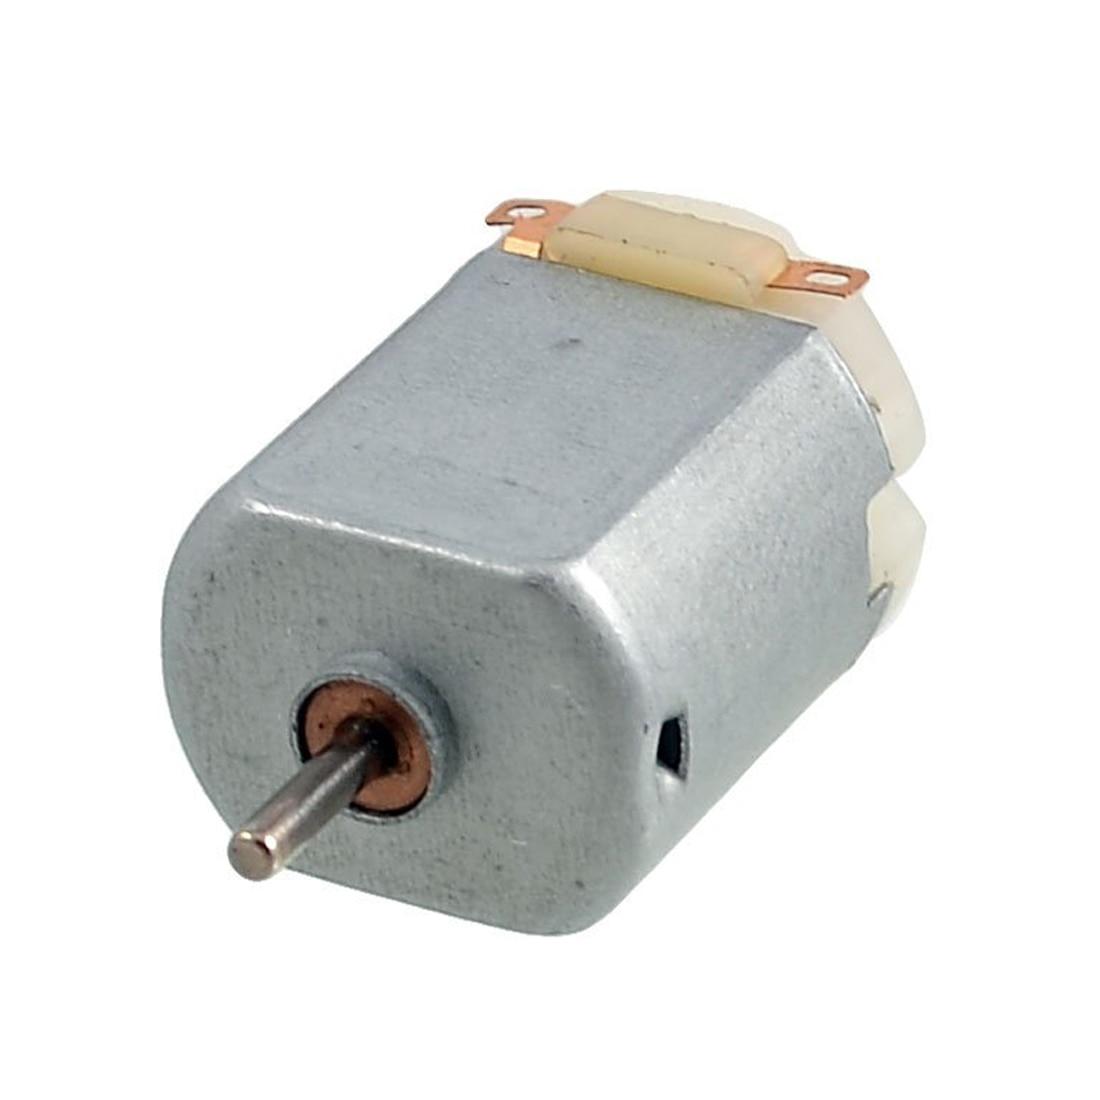 WSFS Hot Sale DC 3V 0 2A 12000RPM 65g cm Mini Electric Motor for DIY font